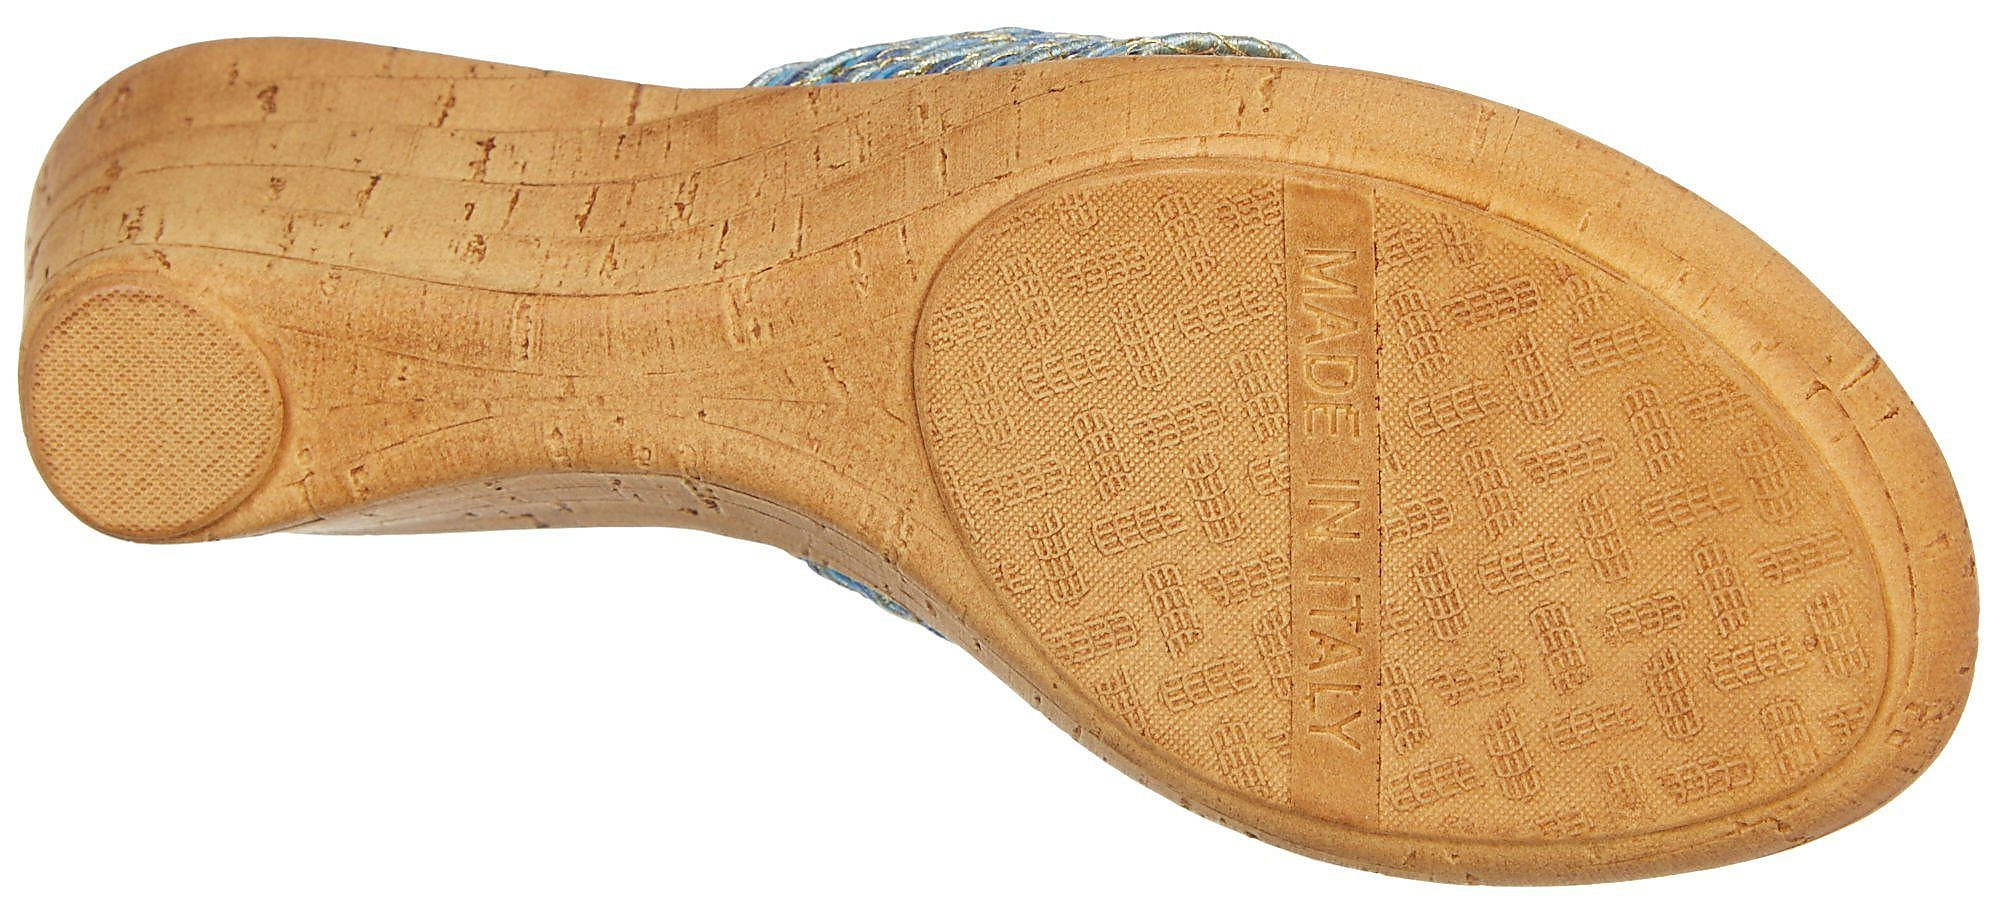 c6b7ea0c8169 Italian Shoemakers Womens Cayman Wedge Sandals